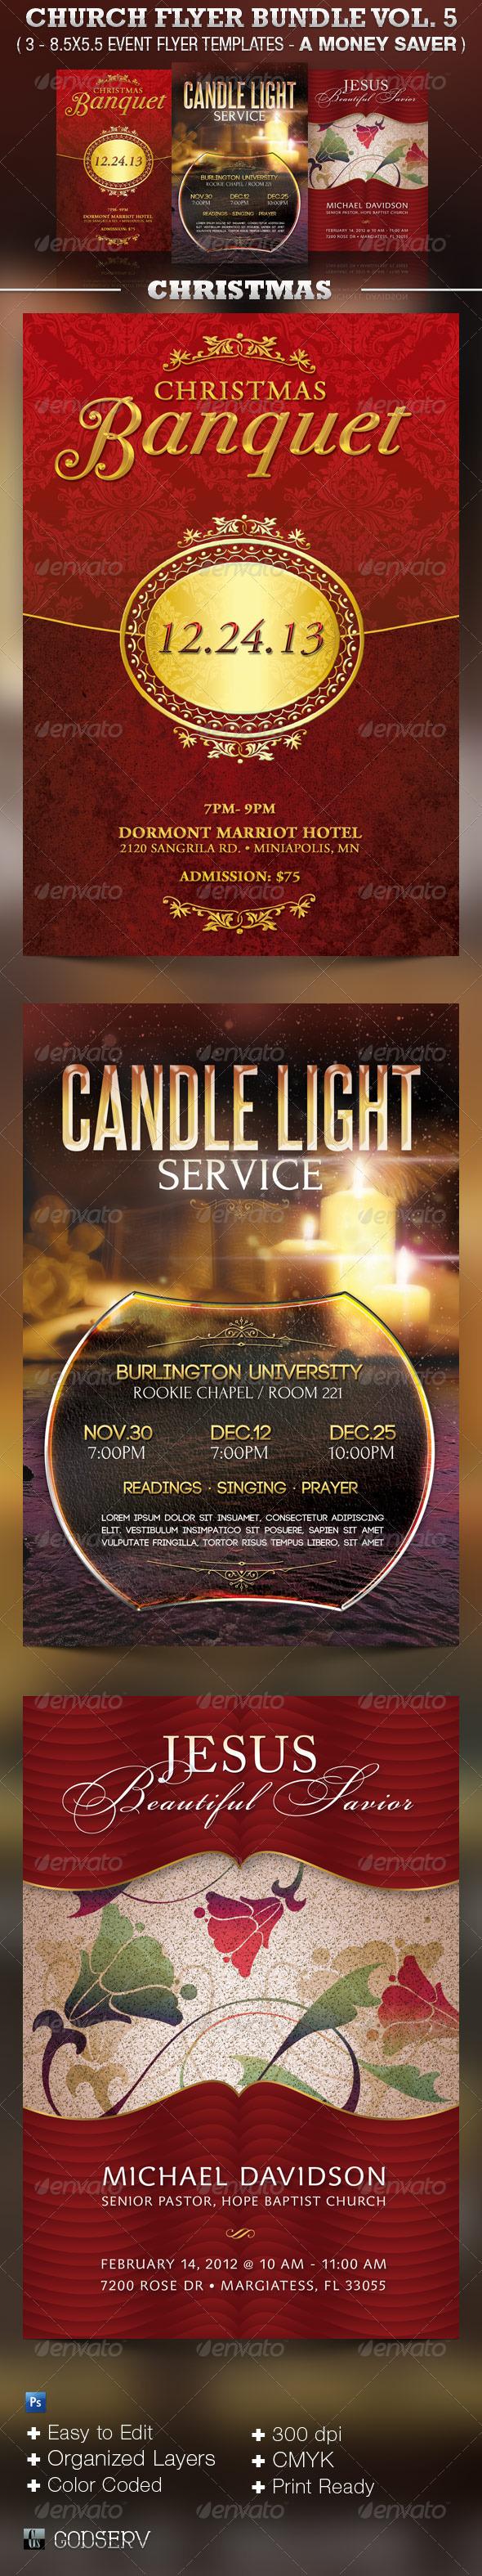 GraphicRiver Church Flyer Template Bundle Vol 5 Christmas 3553527